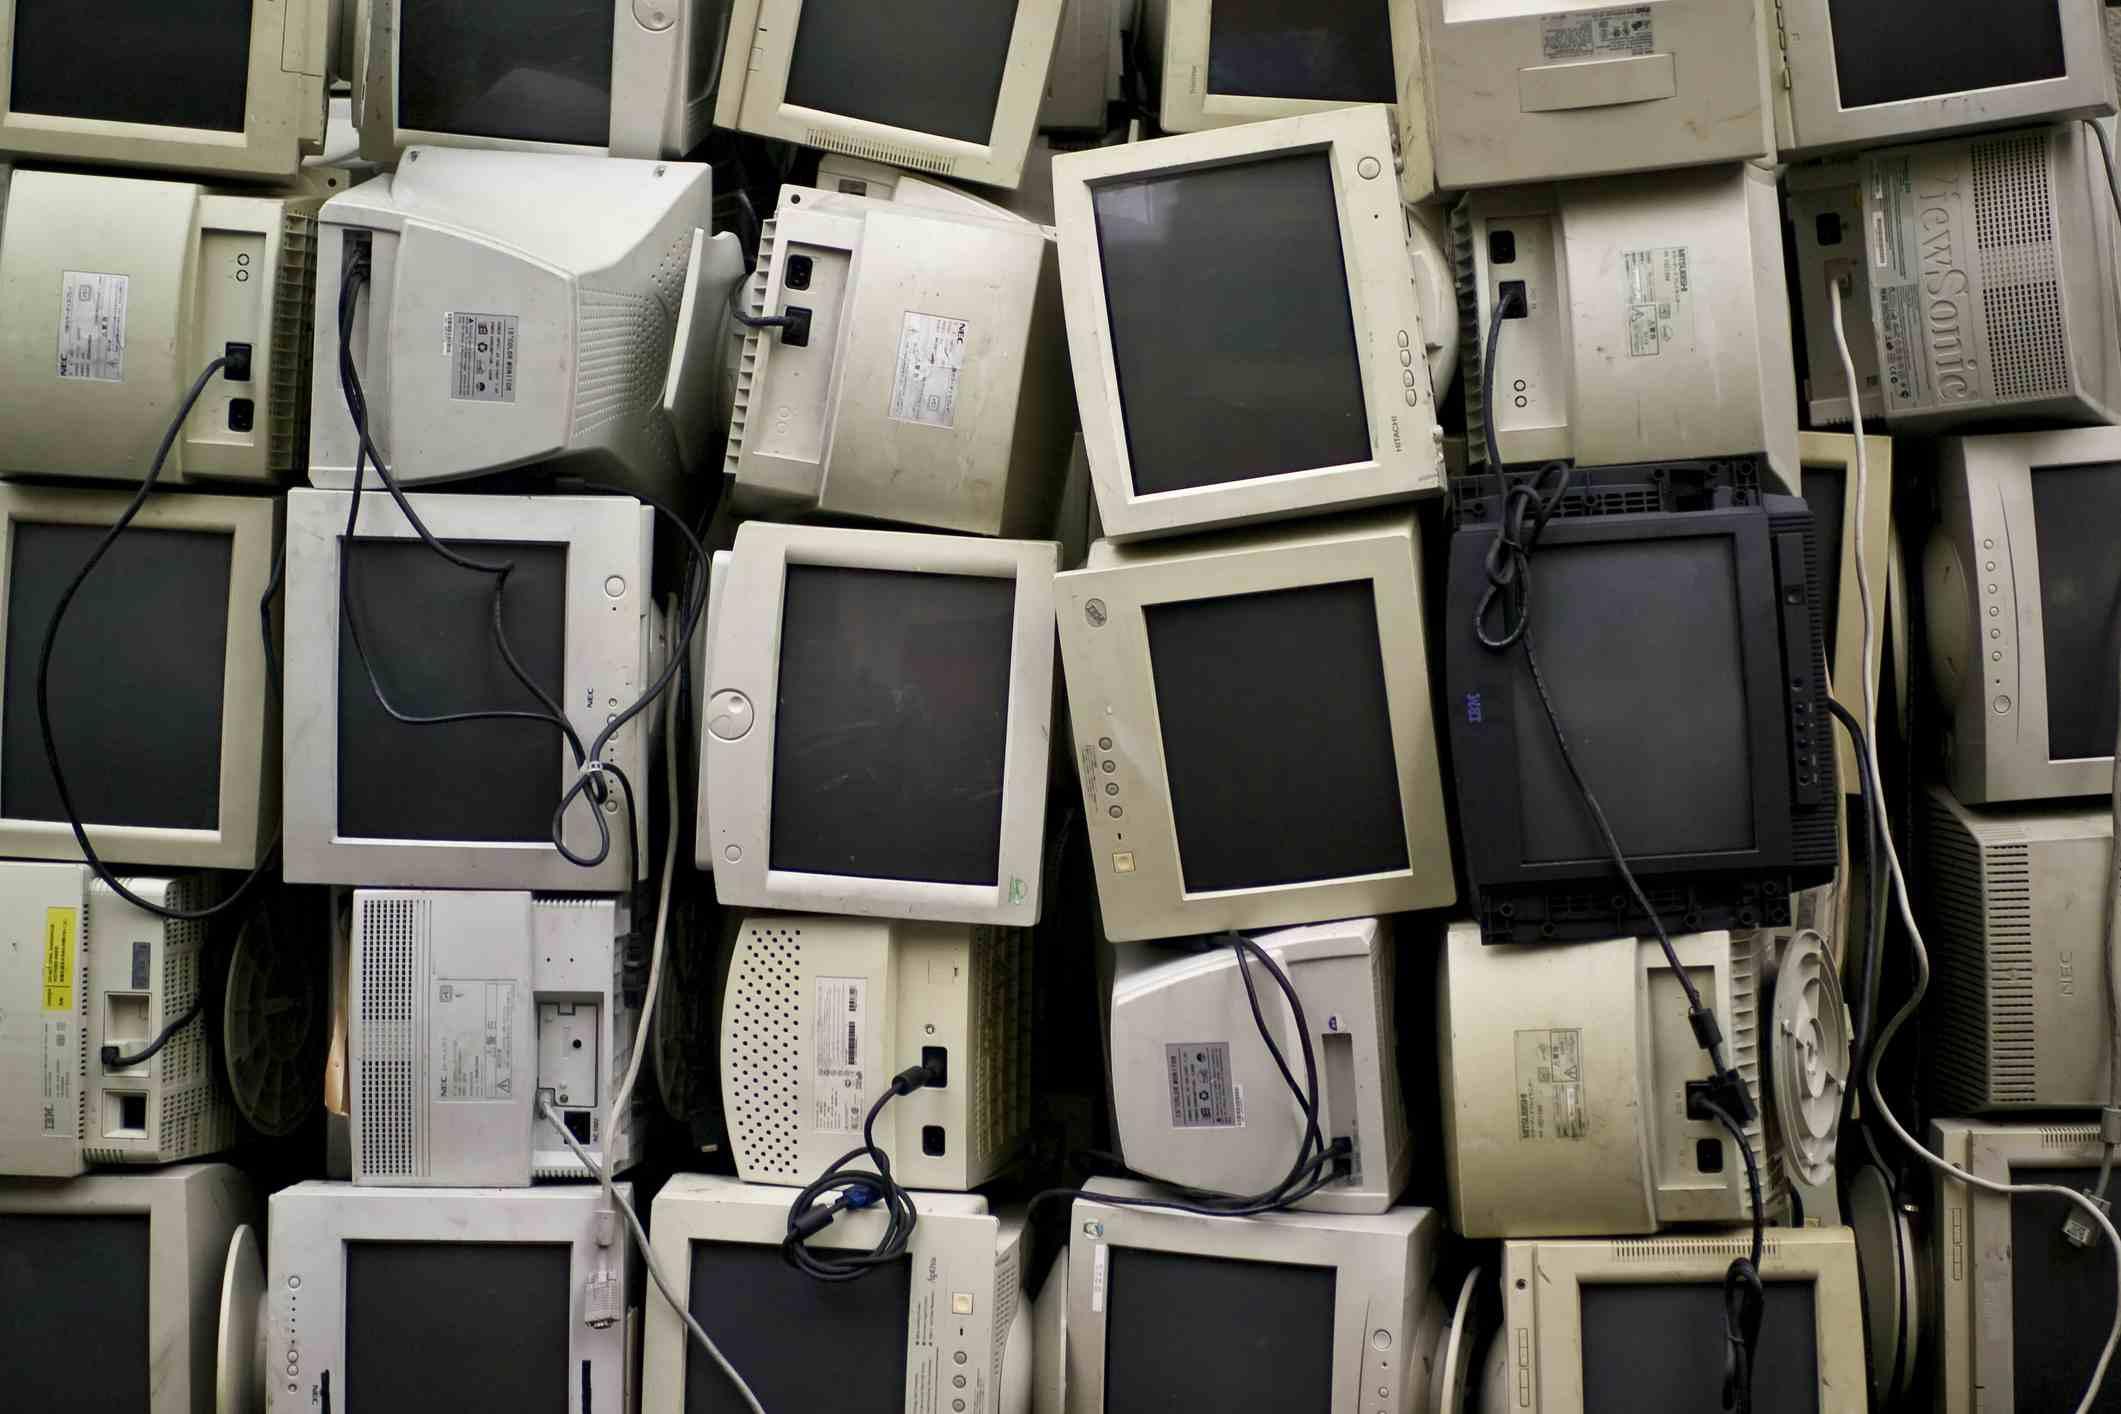 Viejos monitores de computadora